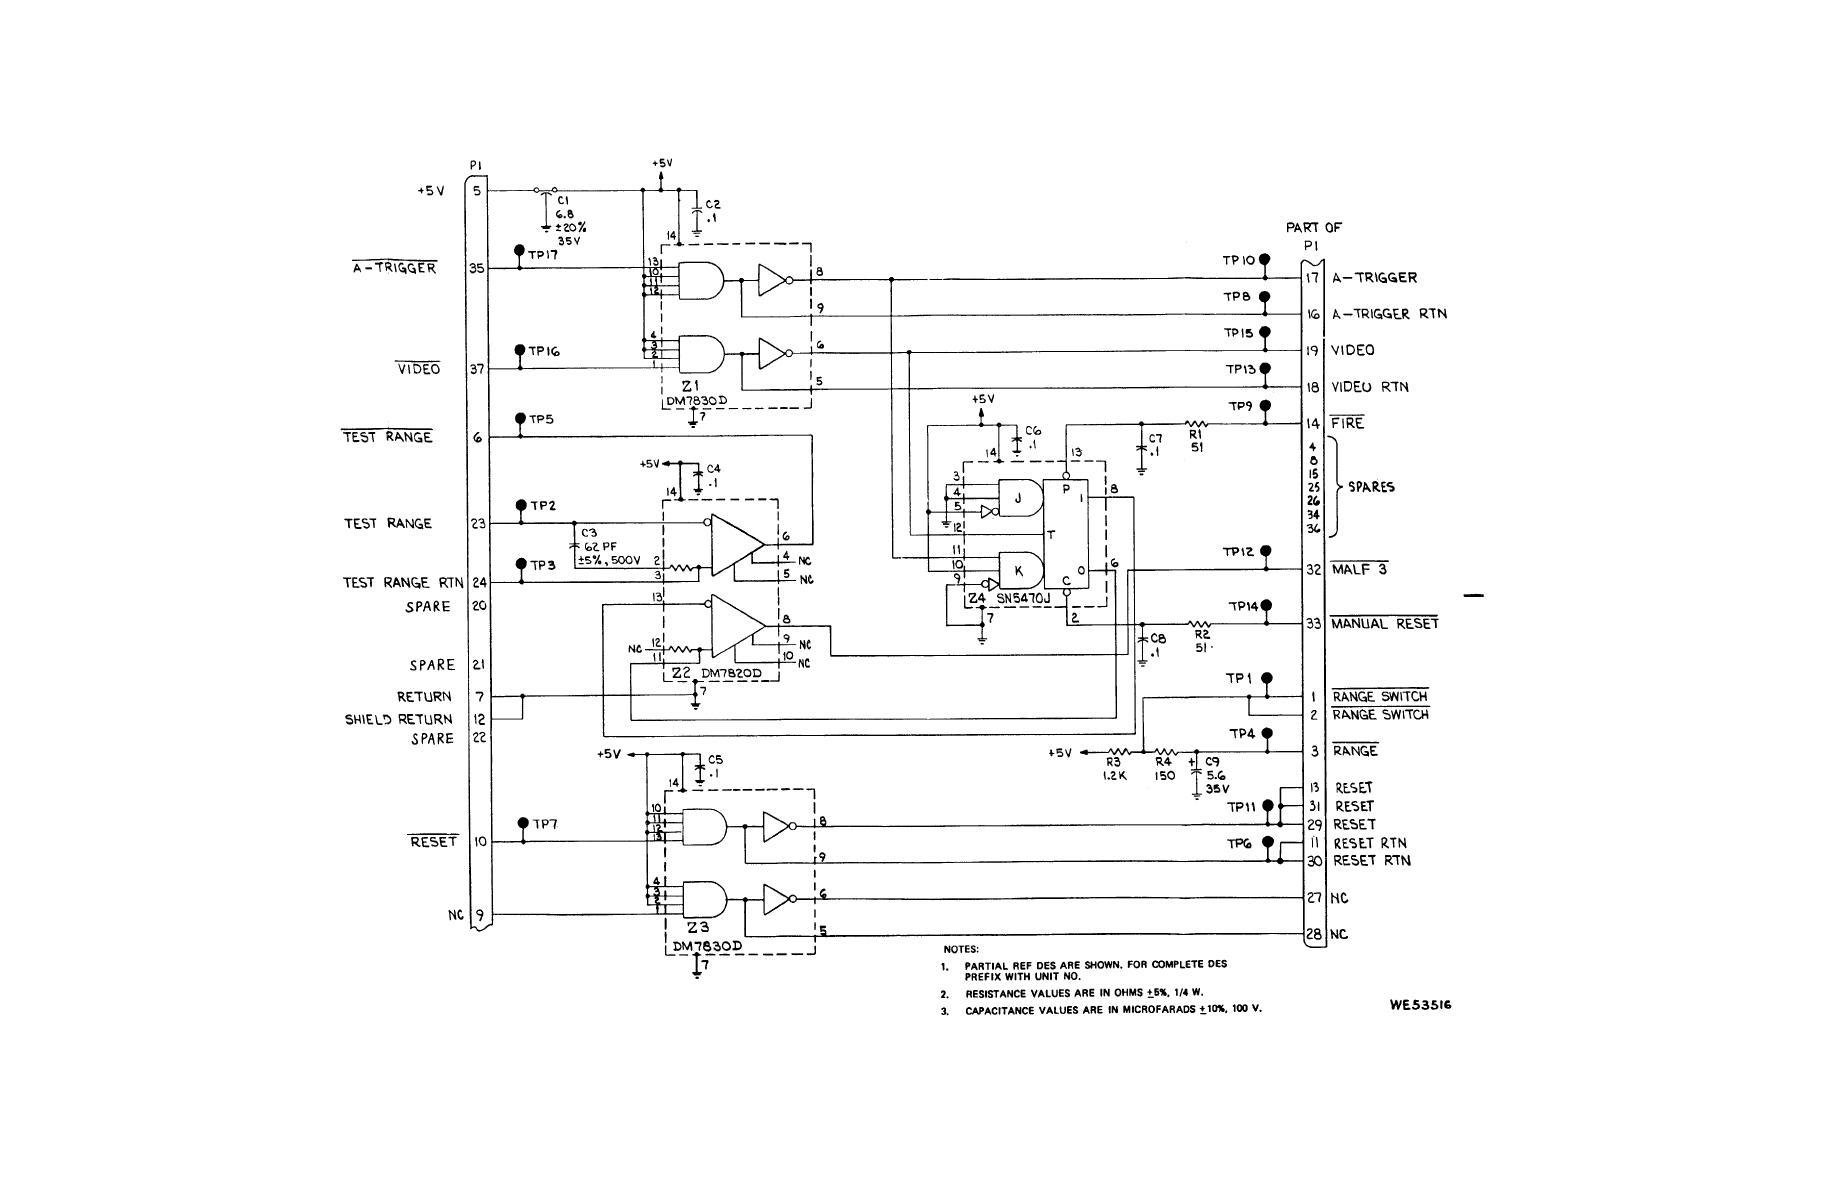 Figure 2-19. Malfunction 3 / buffer logic (A76A1